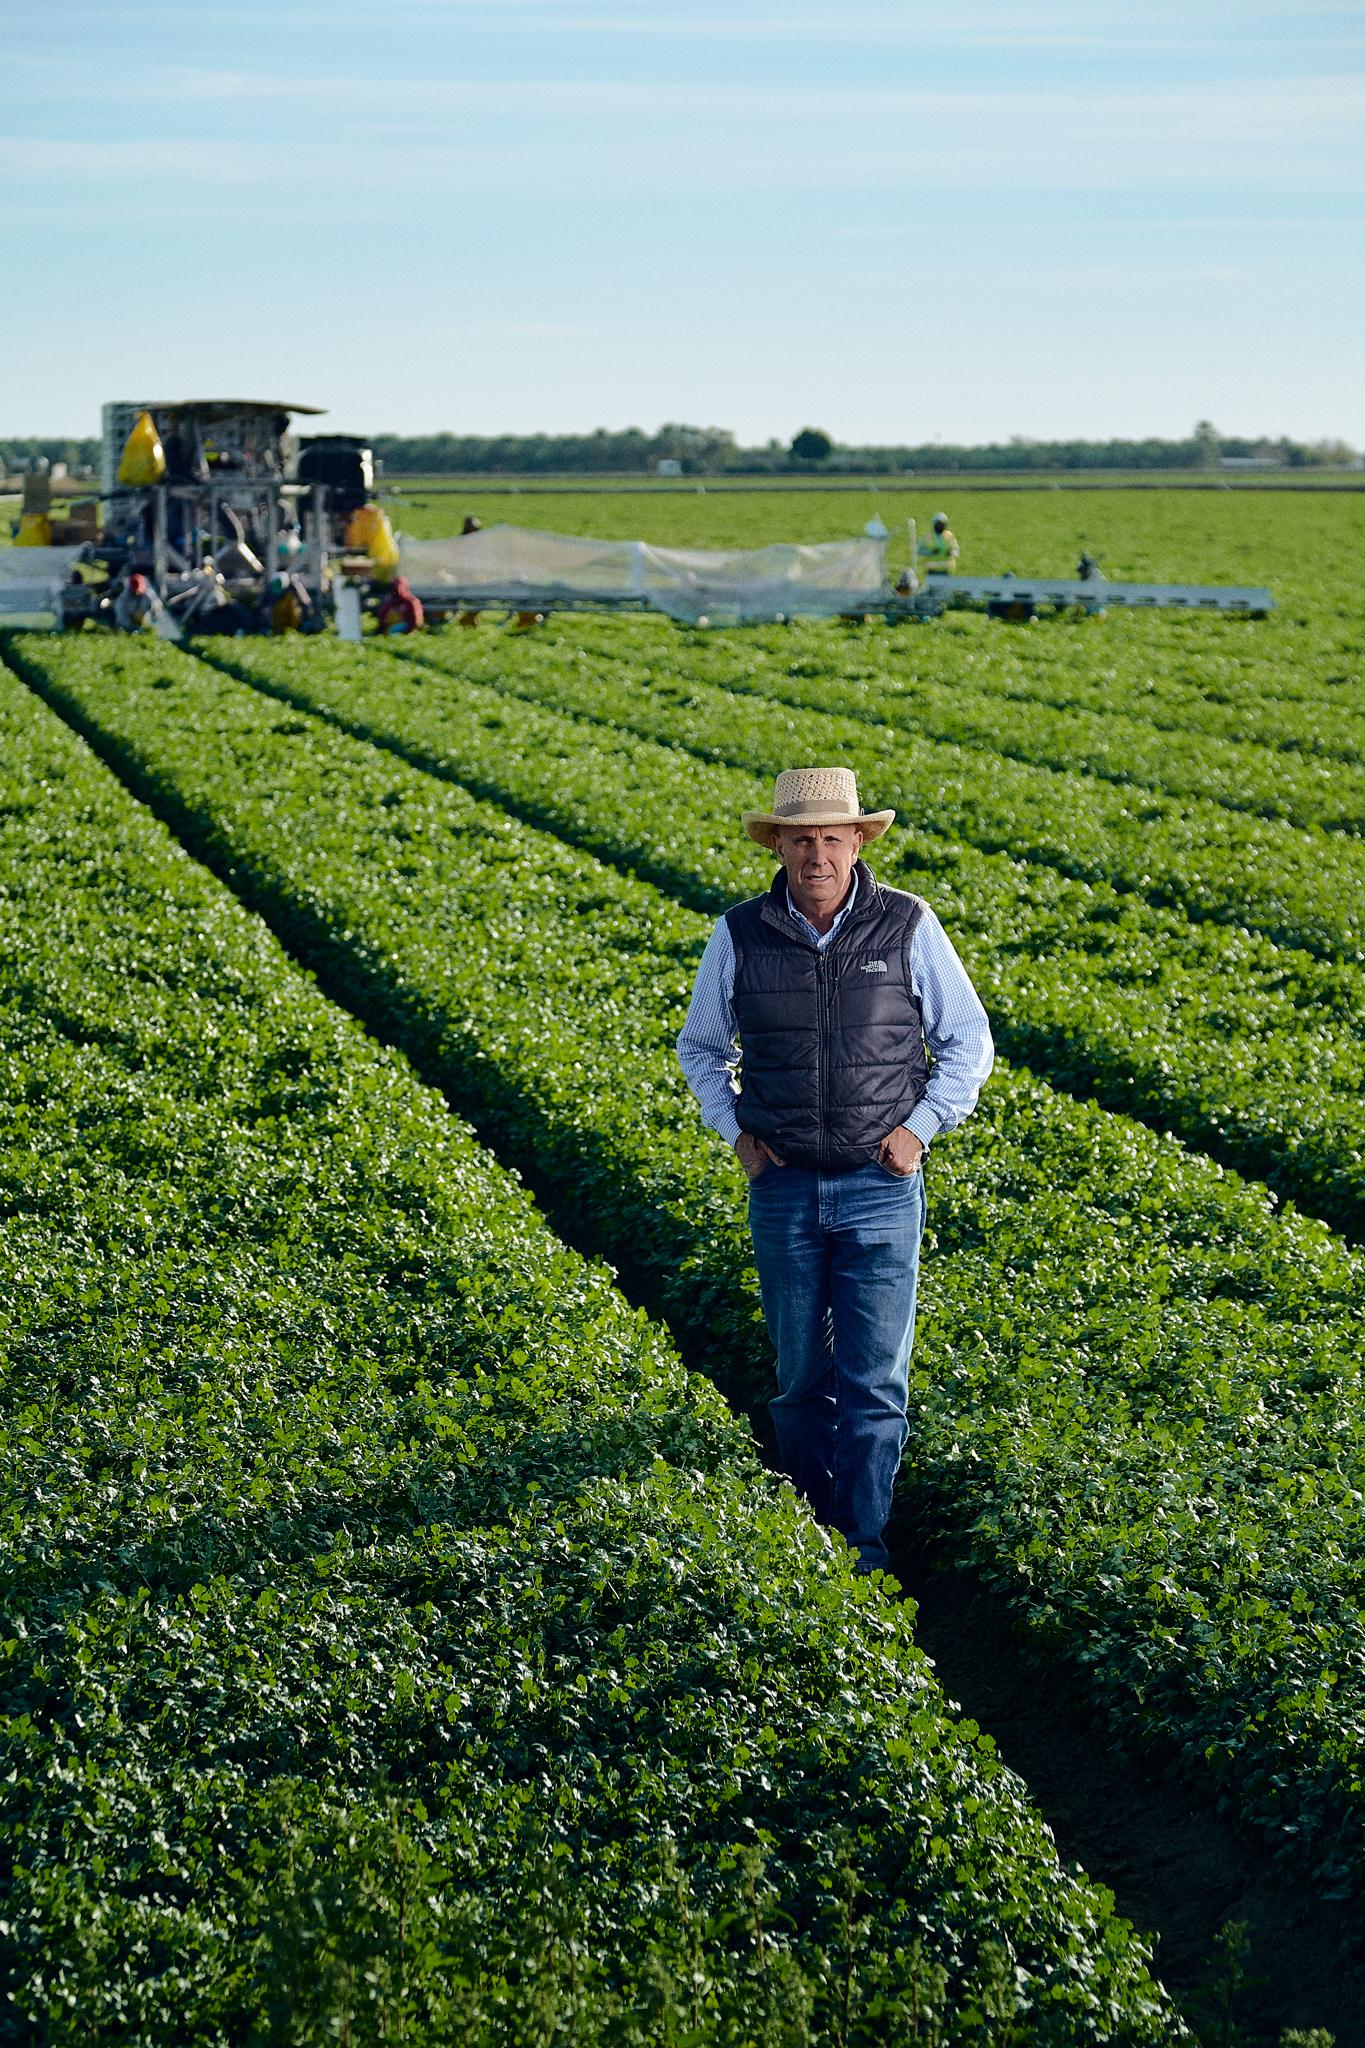 Phoenix Editorial Photographer - Eatingwell Magazine Farmer